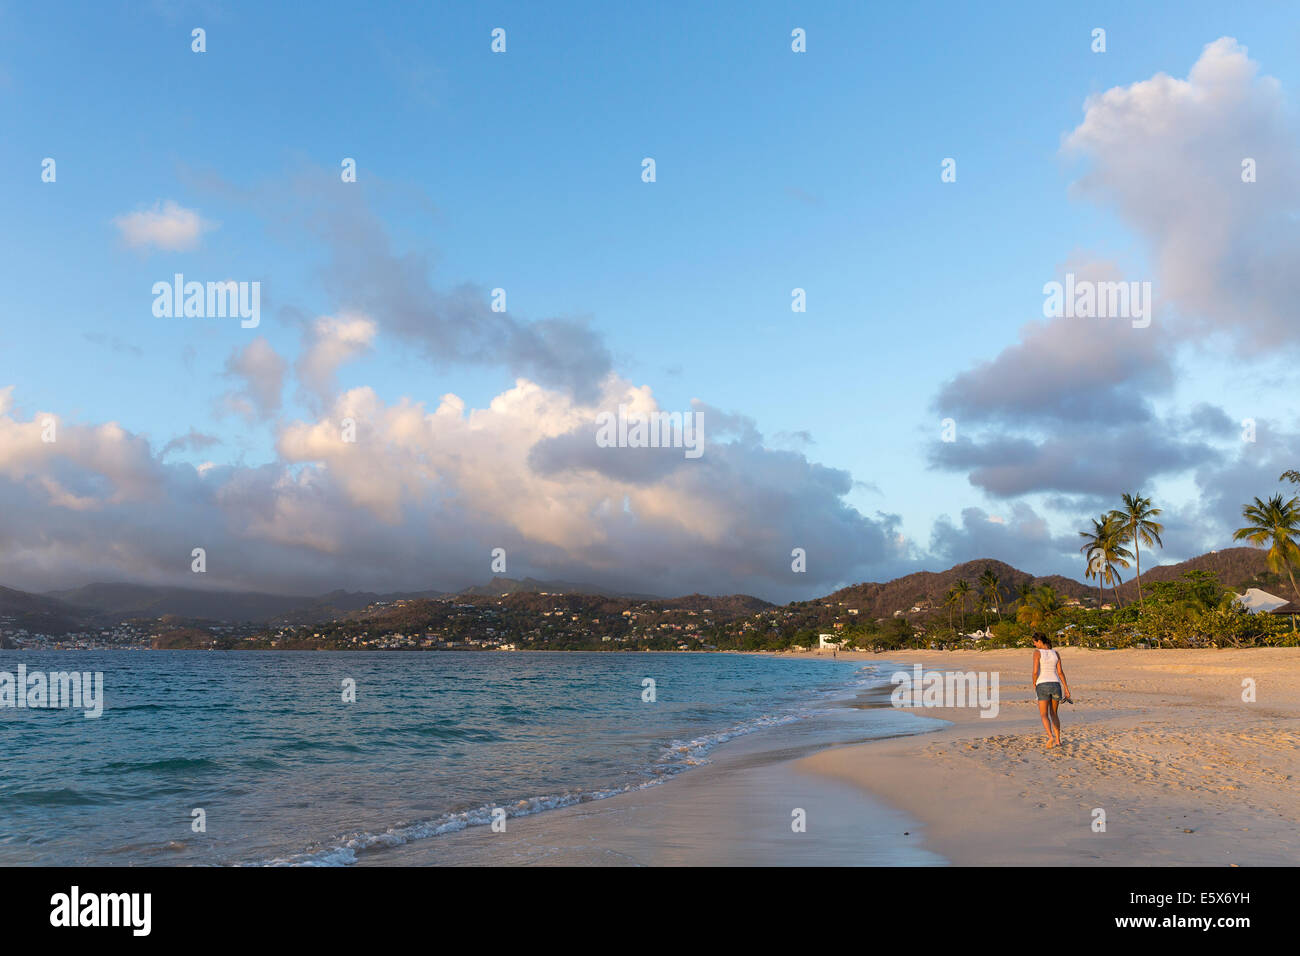 Rear view of mid adult woman strolling on beach, Spice Island beach resort, Grenada, Caribbean - Stock Image